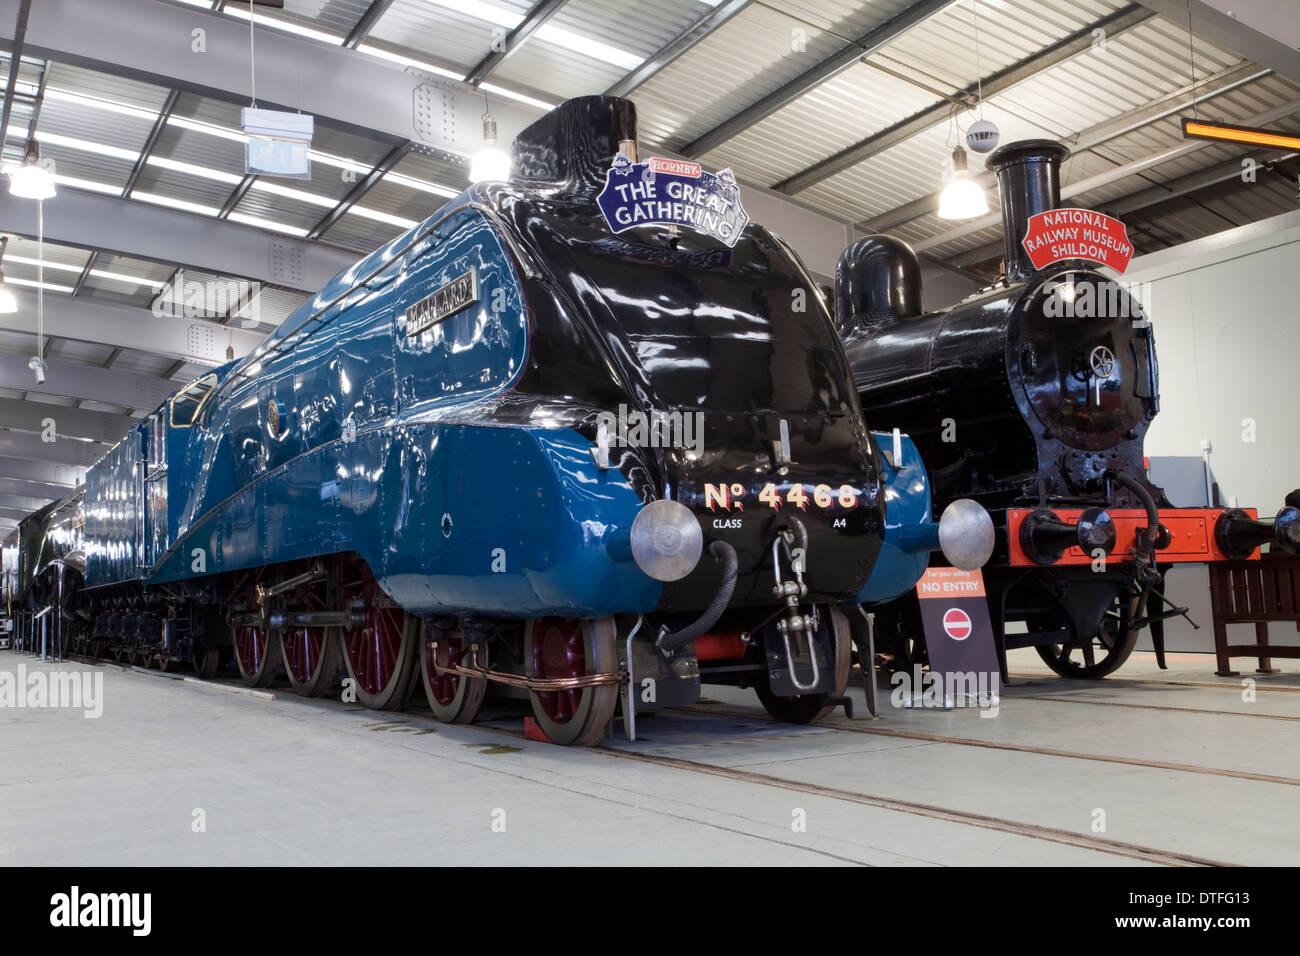 The 'Mallard' Class A4 steam locomotive at the National Railway Museum, Shildon - Stock Image